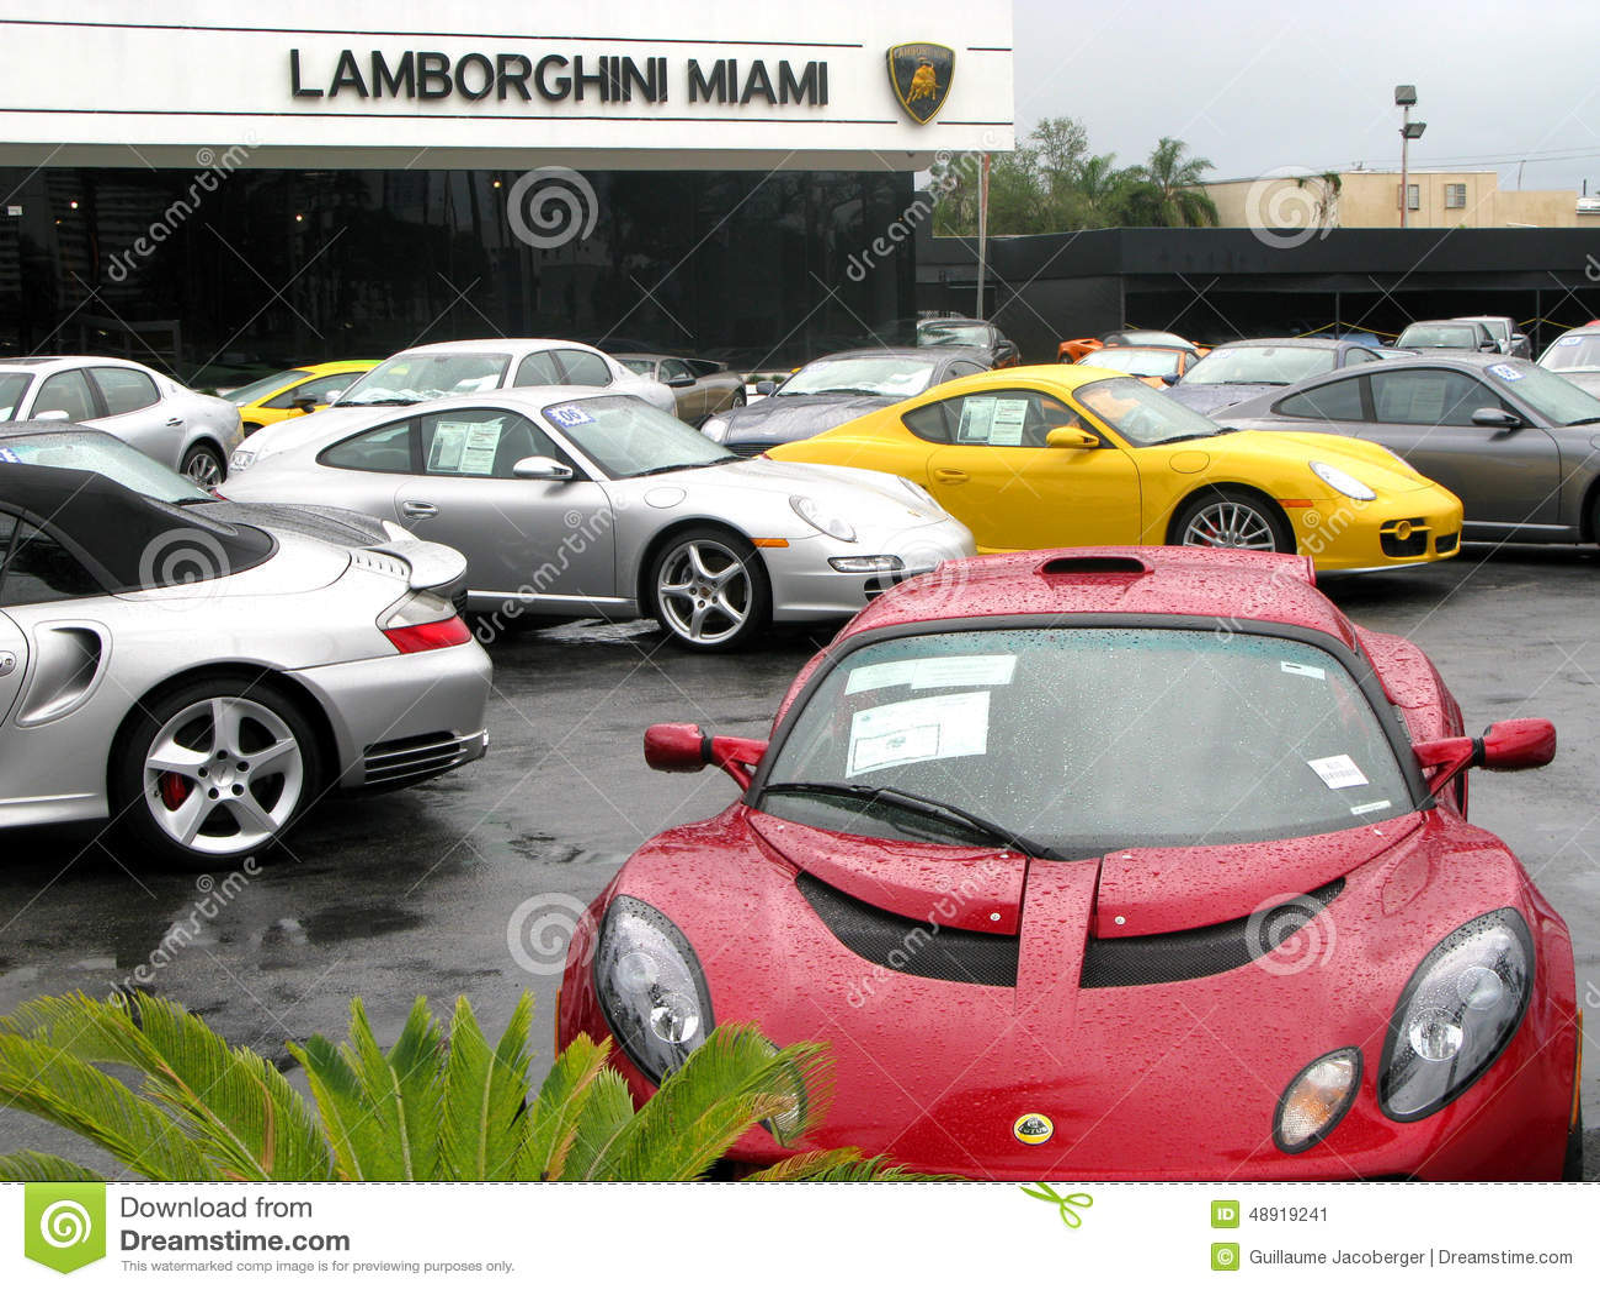 Lamborghini Car Store Id 233 E D Image De Voiture